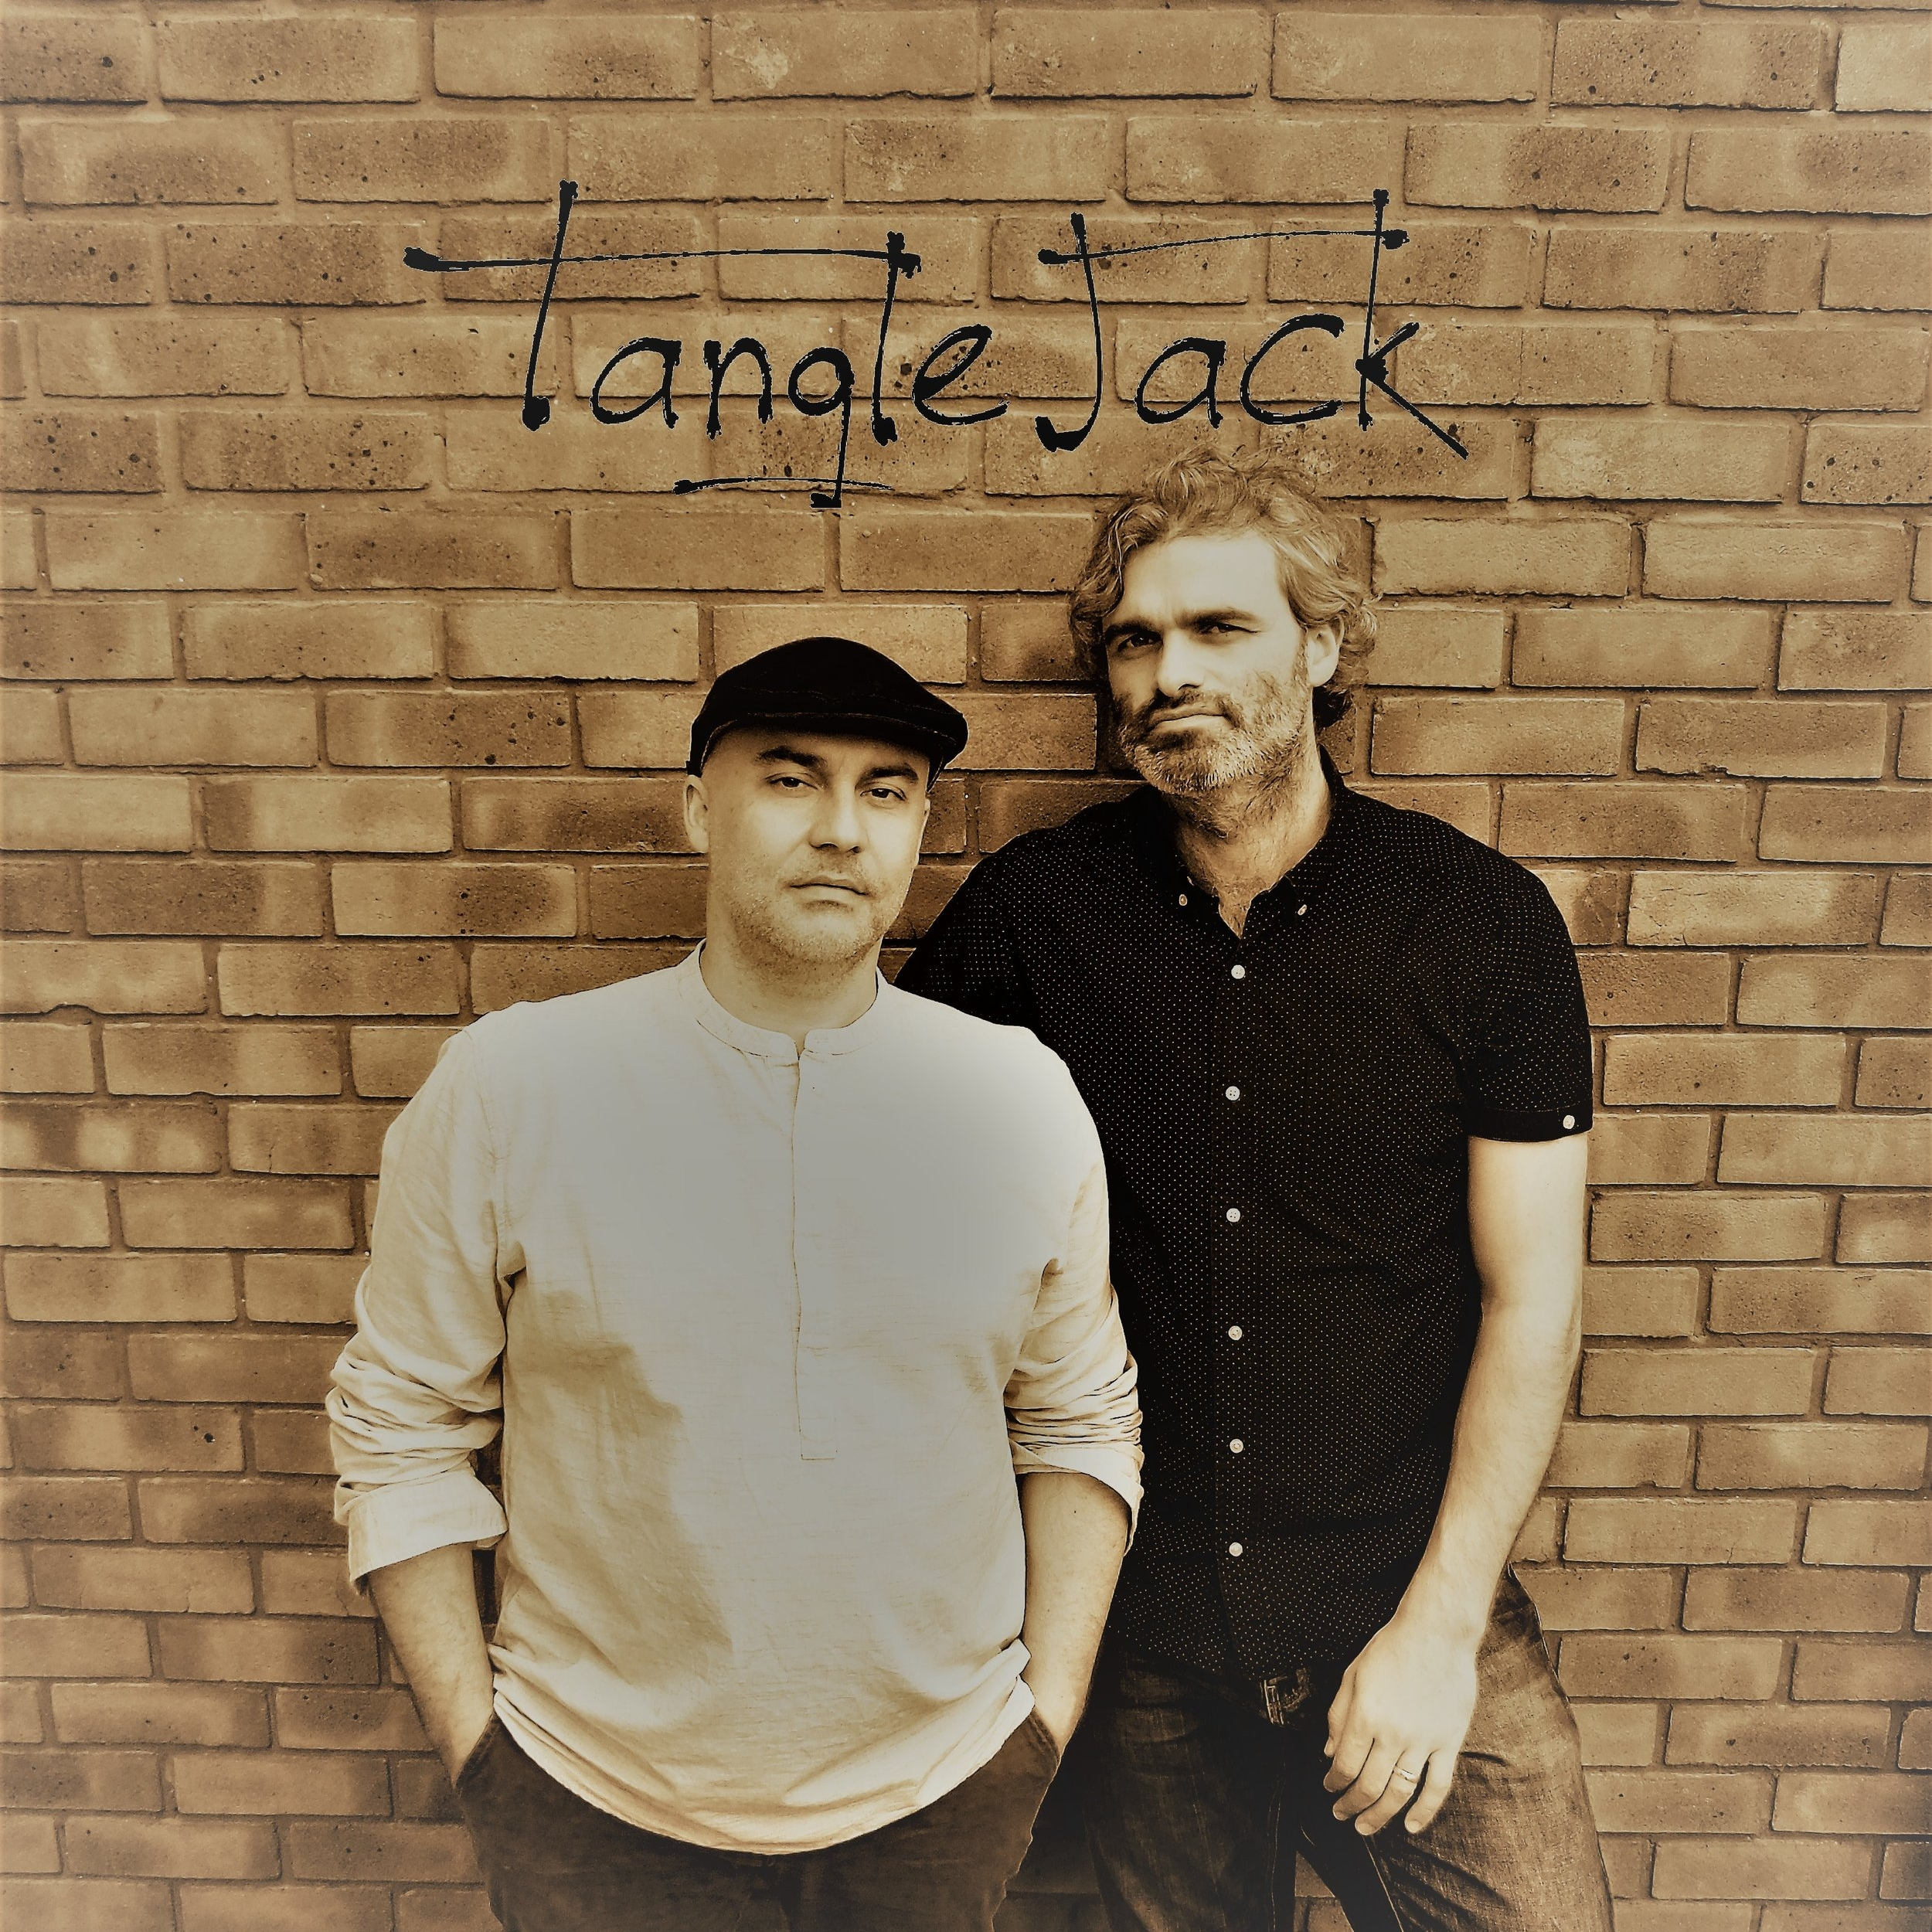 Tangle Jack - Folk Rock Duo